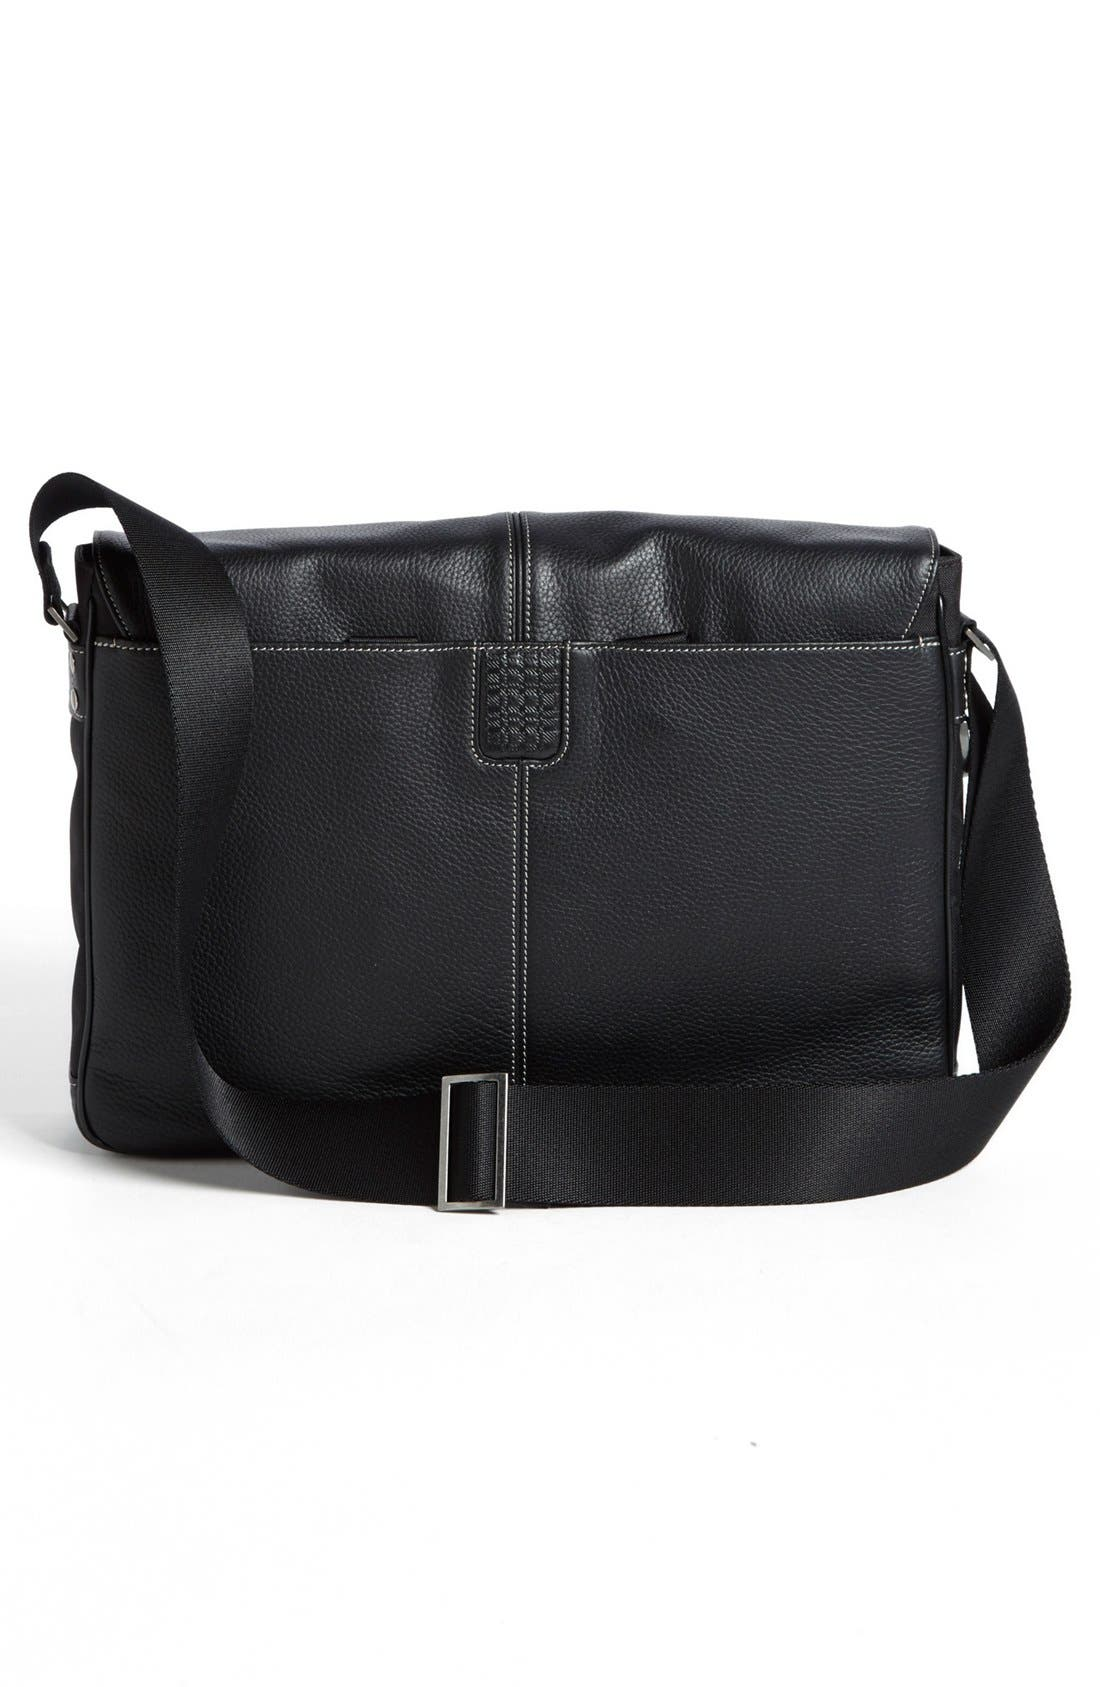 BOCONI, Tyler Slim Leather Laptop Briefcase, Alternate thumbnail 3, color, BLACK/ KHAKI